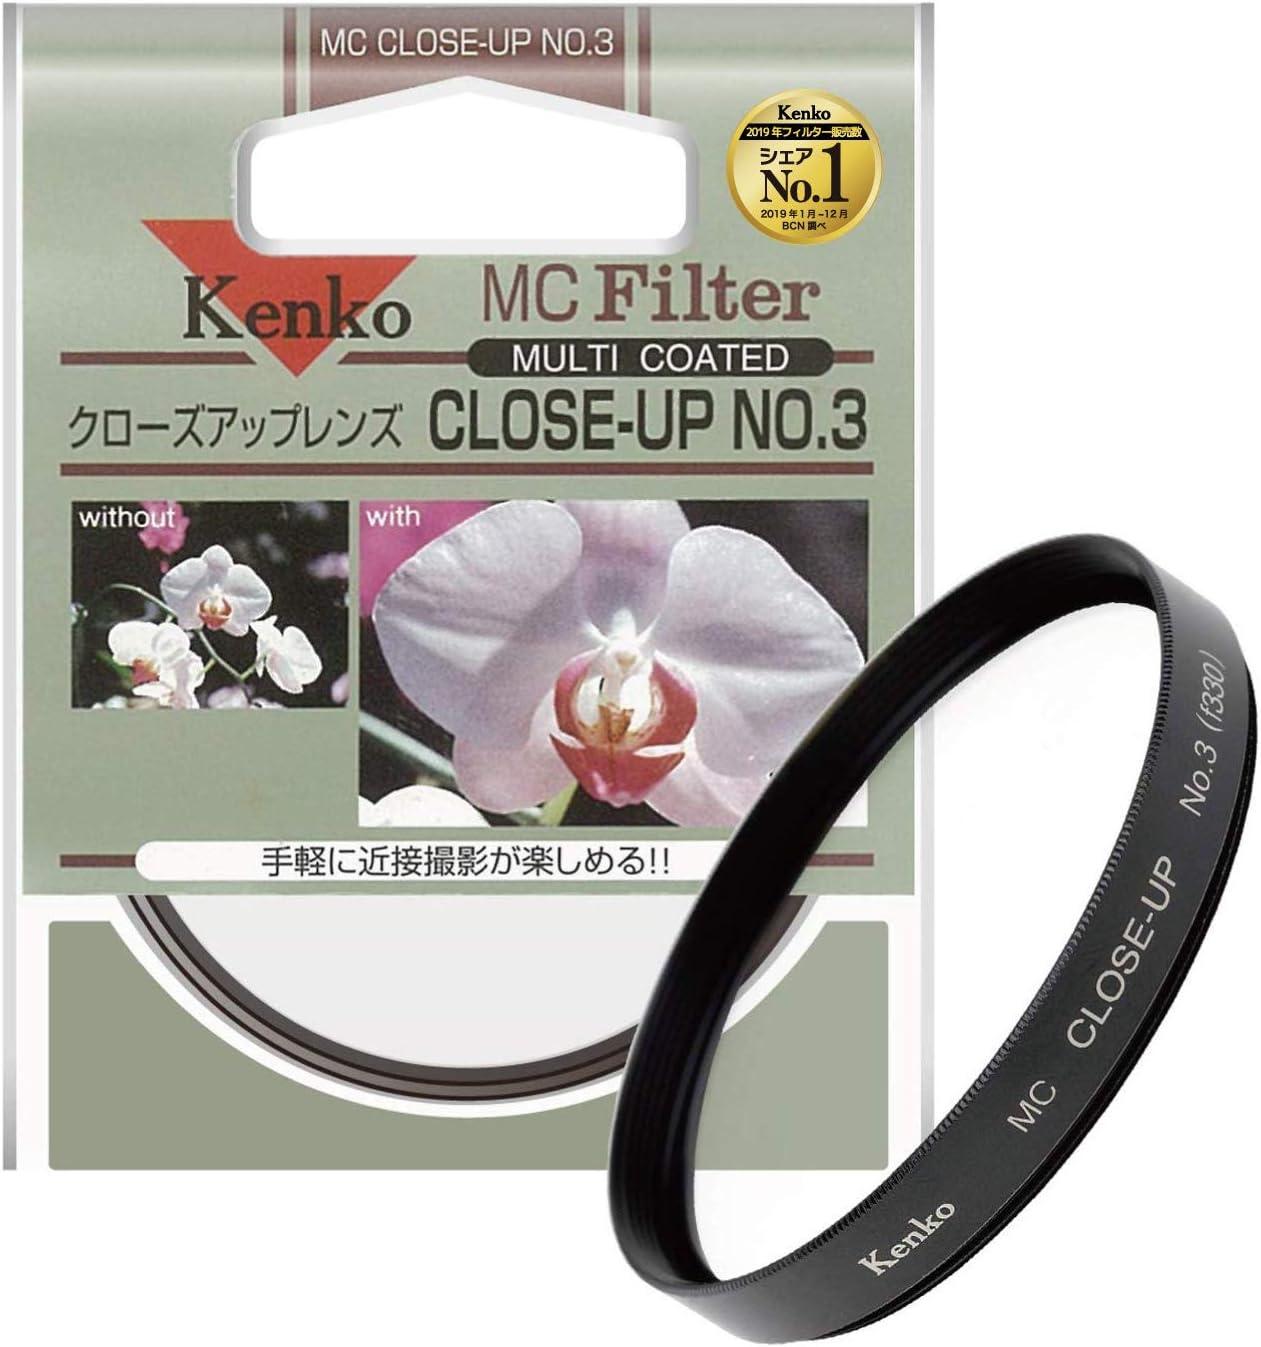 Kenko Close-Up Lens 43mm MC No.2 Multi-Coated